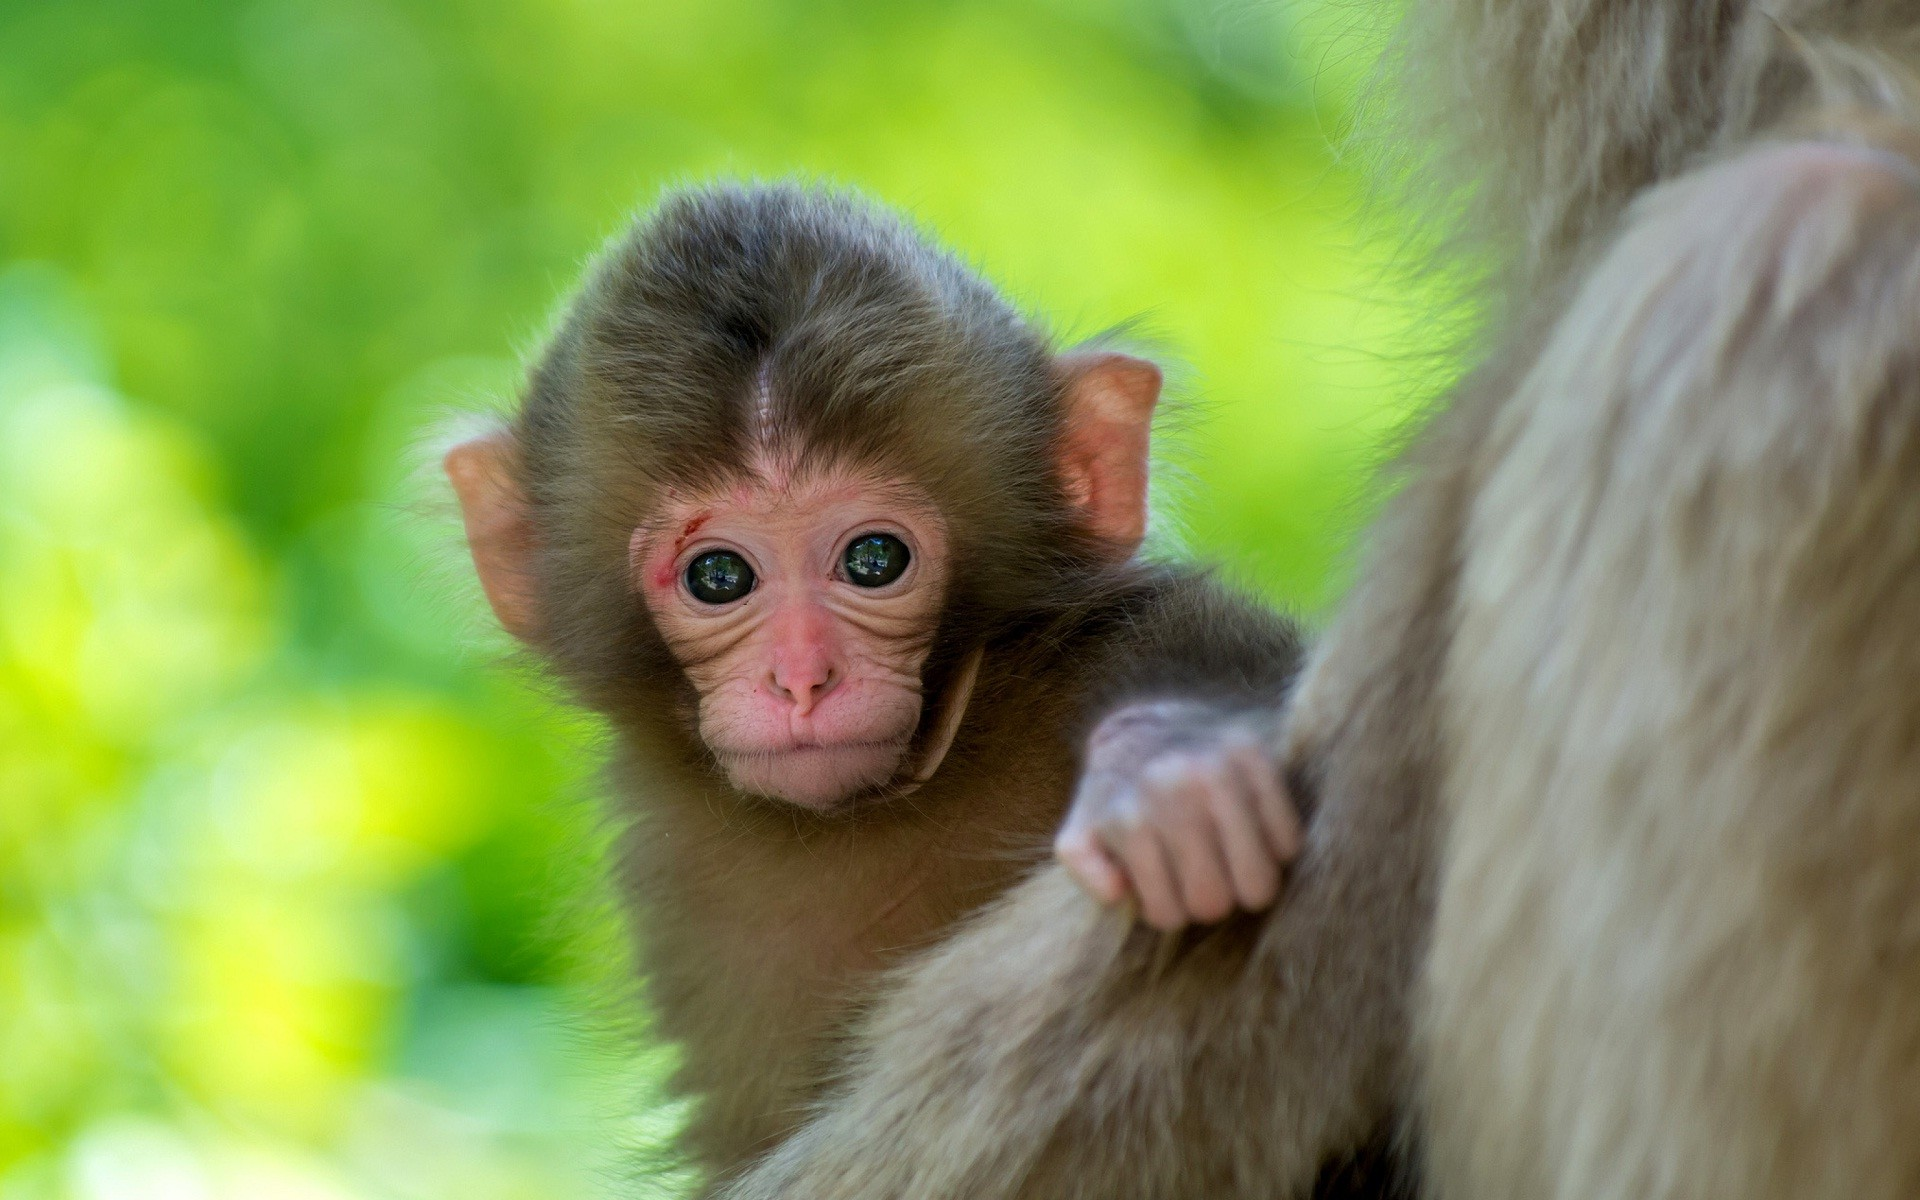 Cute Monkey Baby Animal Wallpaper Data Src Vertical Cute Baby Animals Hd 1920x1200 Download Hd Wallpaper Wallpapertip